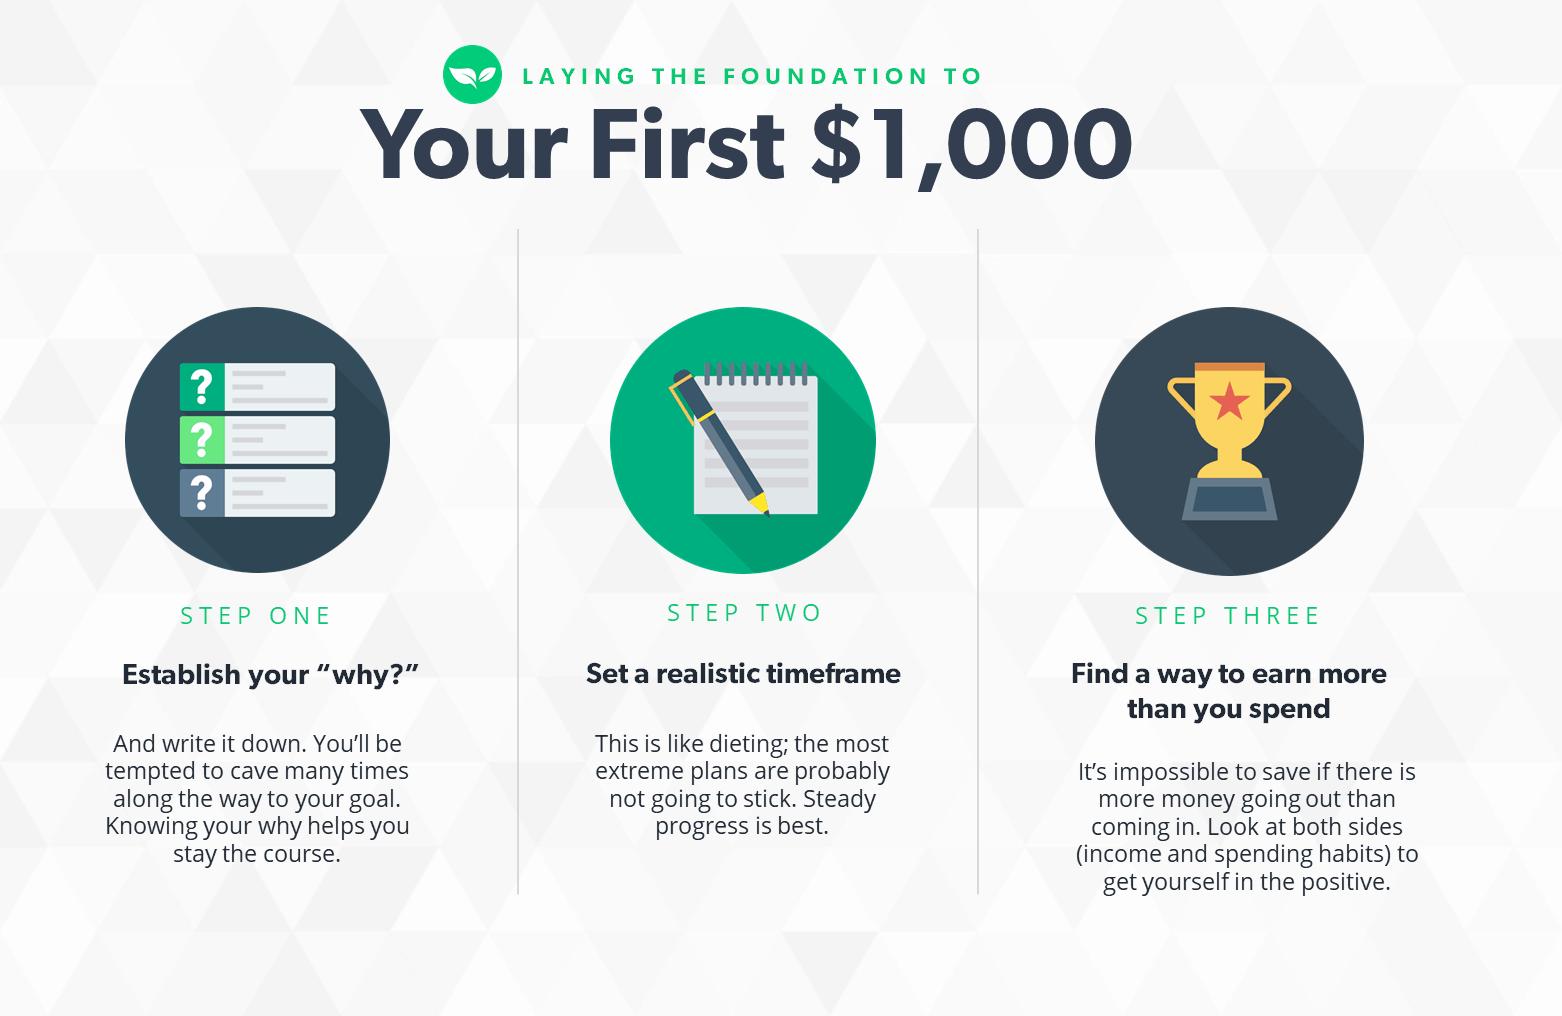 the steps to saving $1000